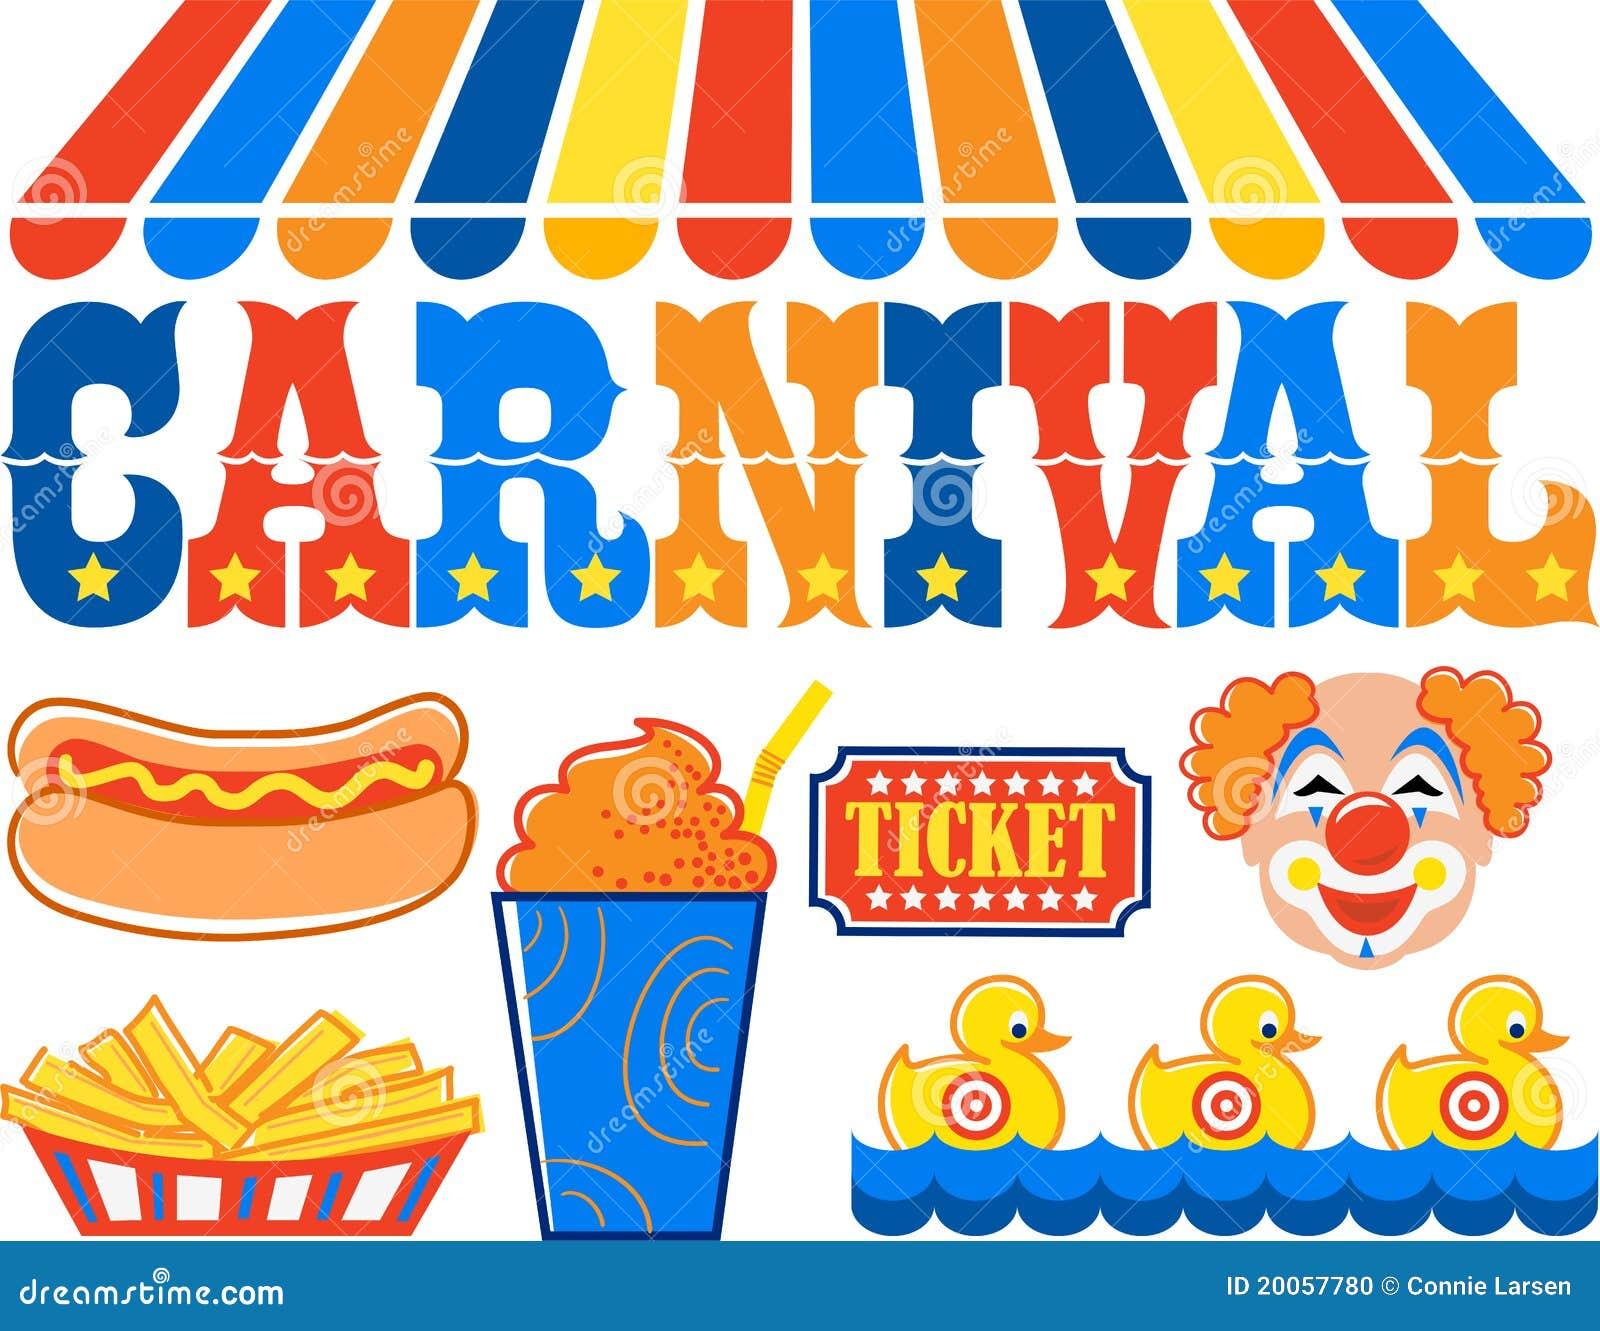 Carnaval Clipart/eps